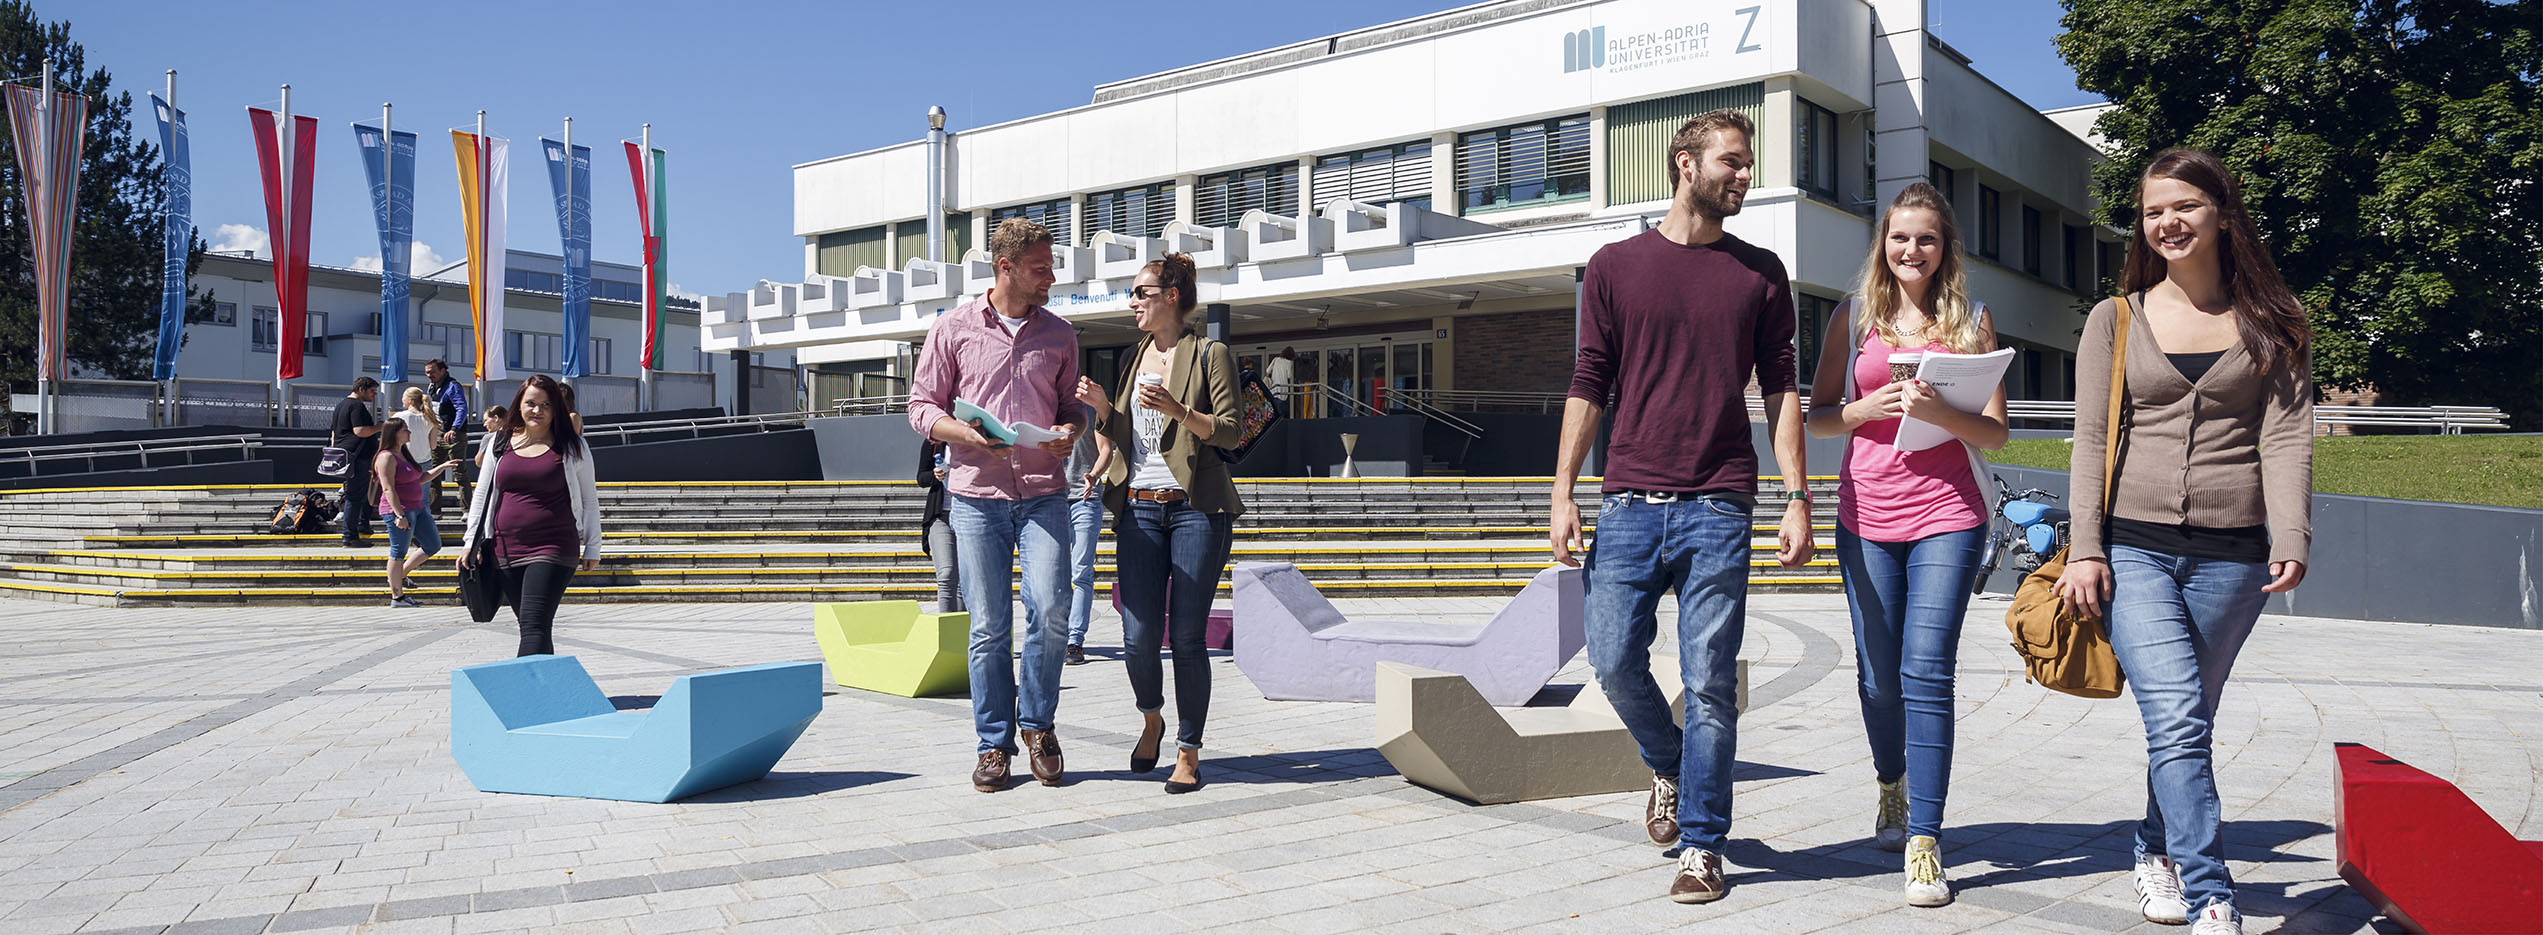 Studierende vor der AAU | Foto:aau/tinefoto.com